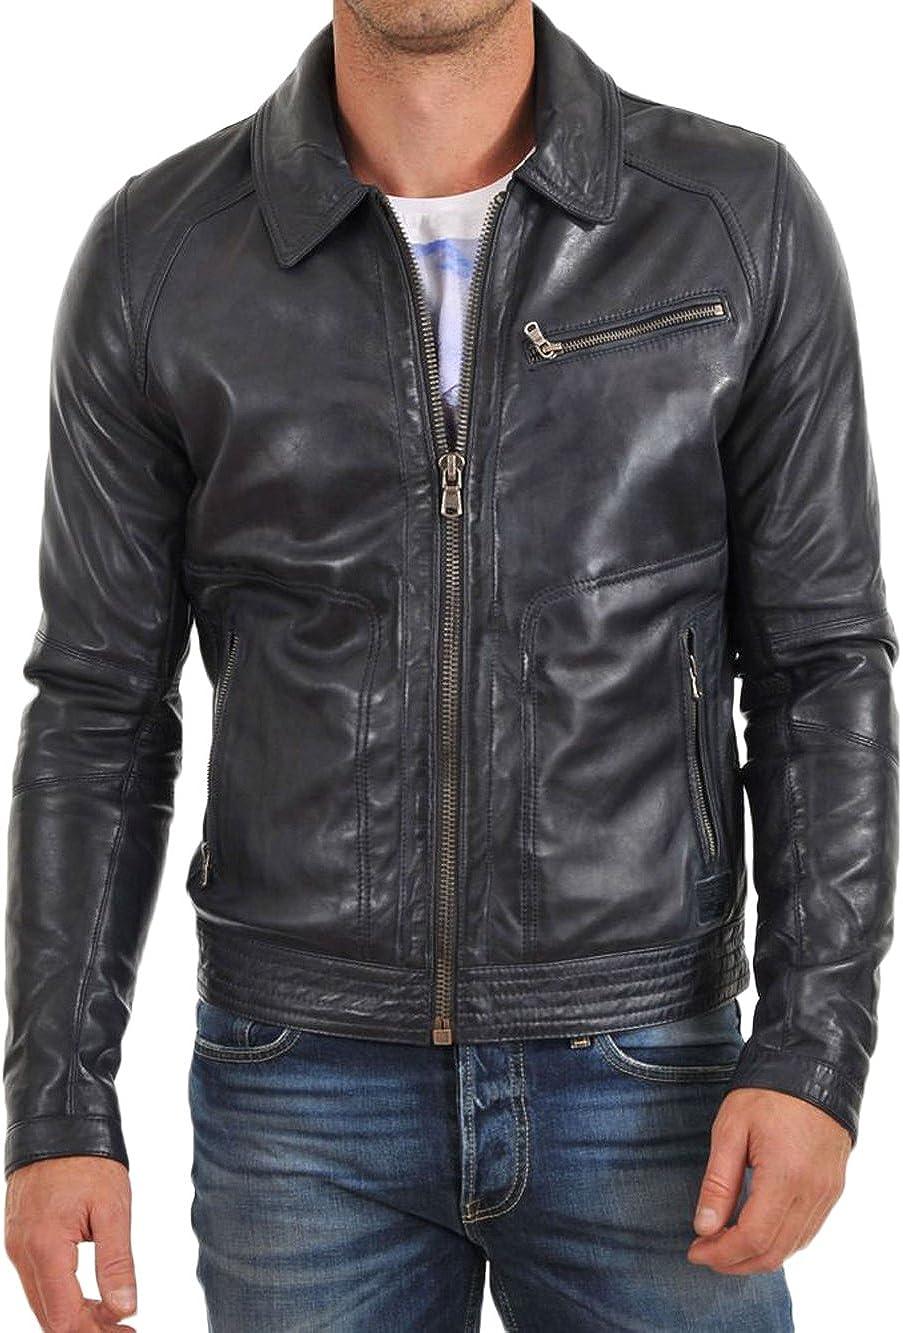 Kingdom Leather Men Slim Fit Biker Motorcycle Cow Leather Jacket Coat Outwear Jackets XC1238